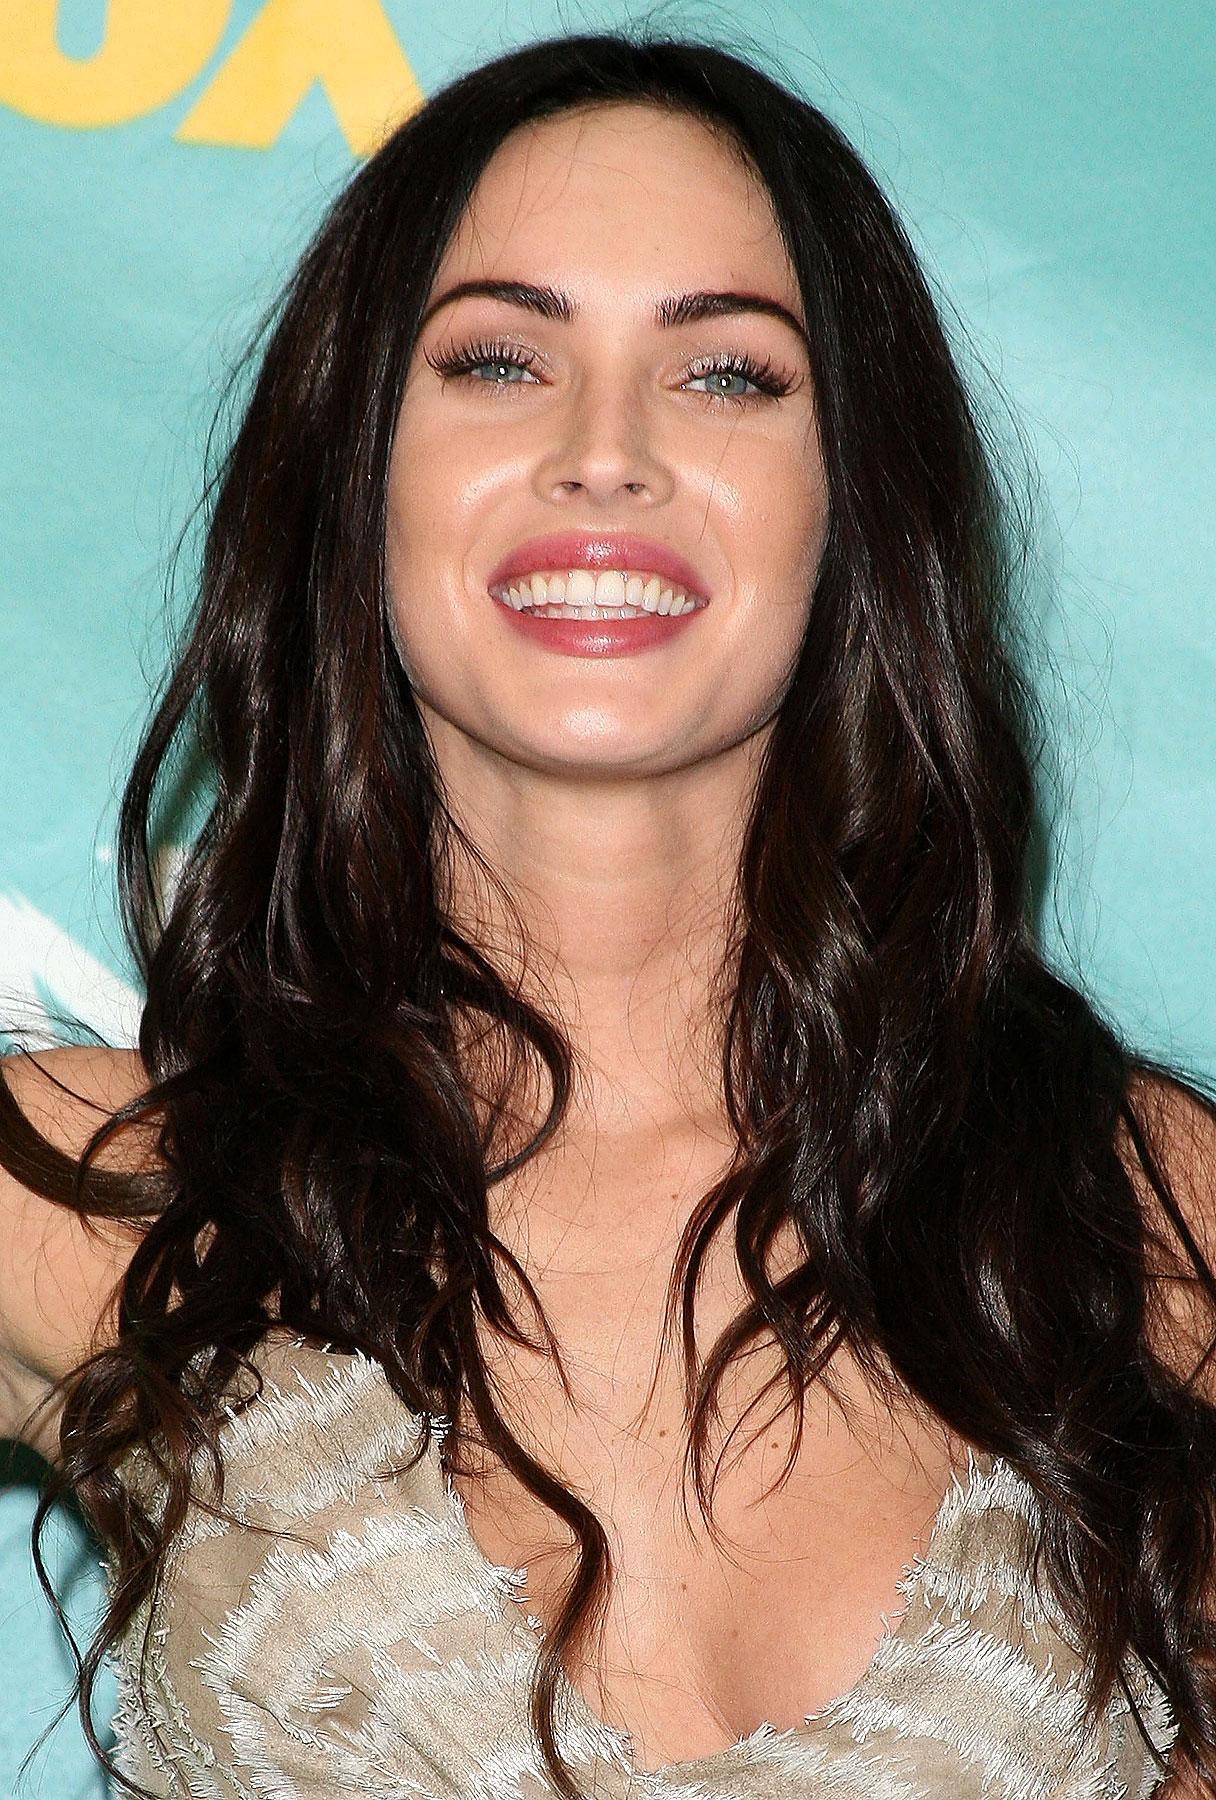 Megan Fox To Host Saturday Night Live